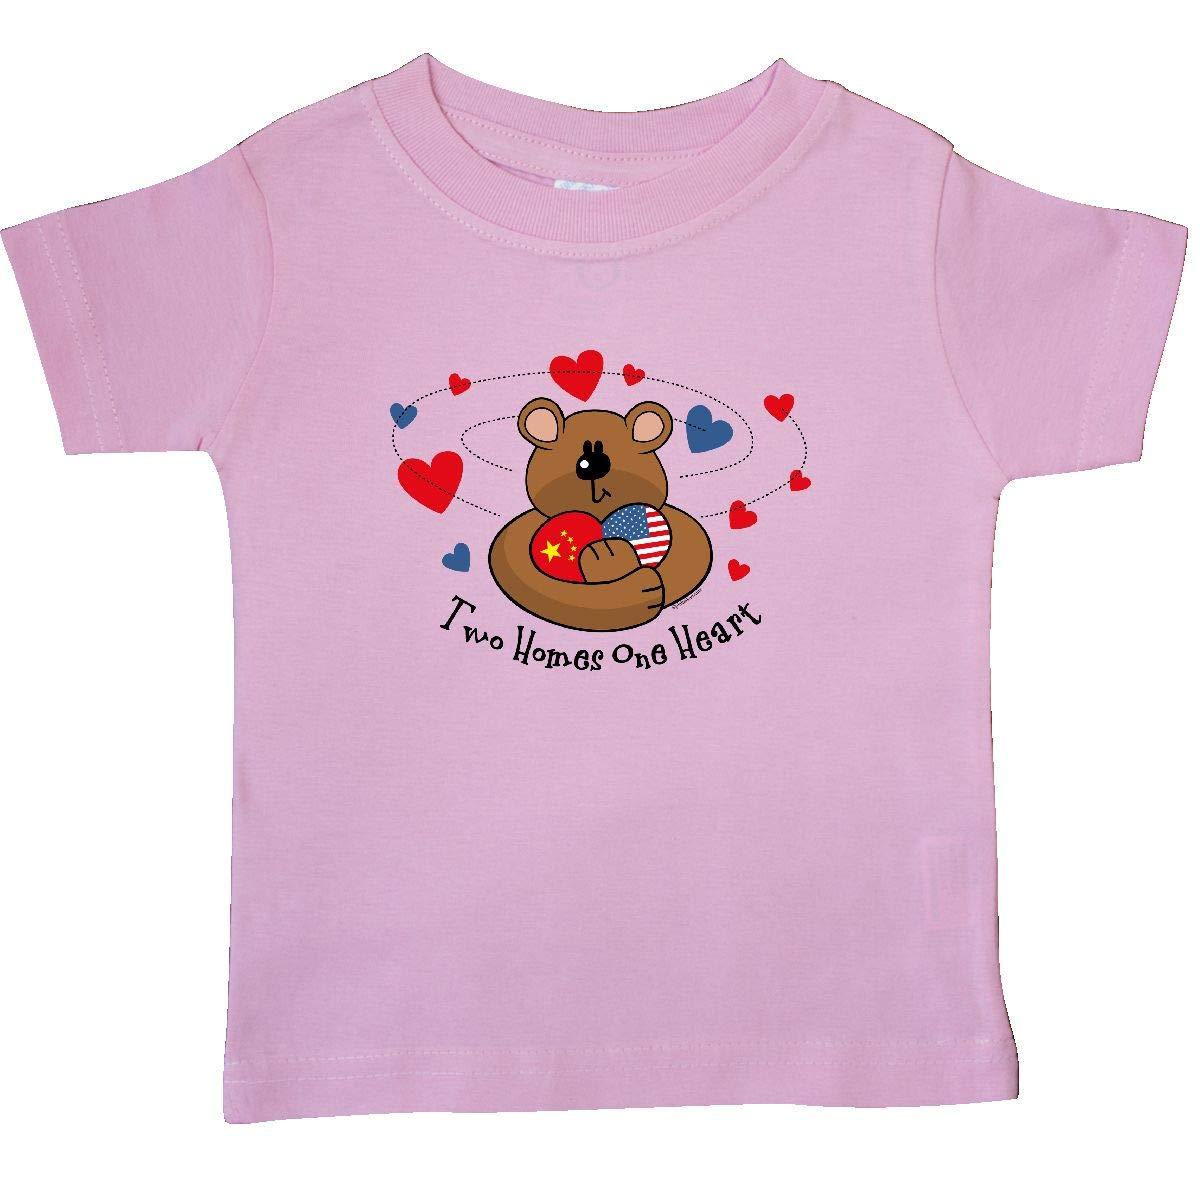 inktastic 2 Homes 1 Heart China Baby T-Shirt